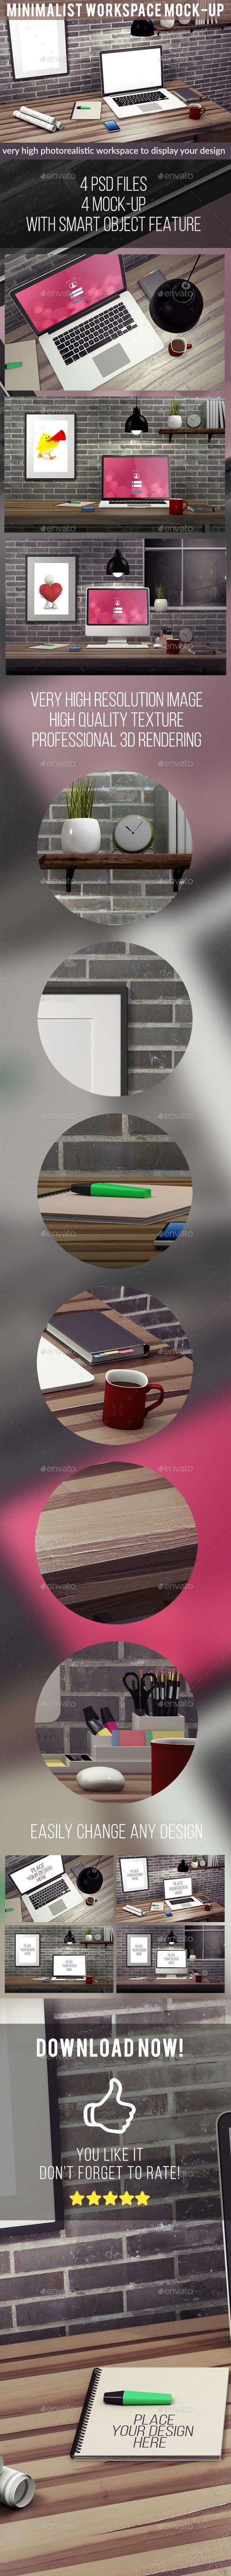 Minimalist Workspace Mock-Up (Displays)